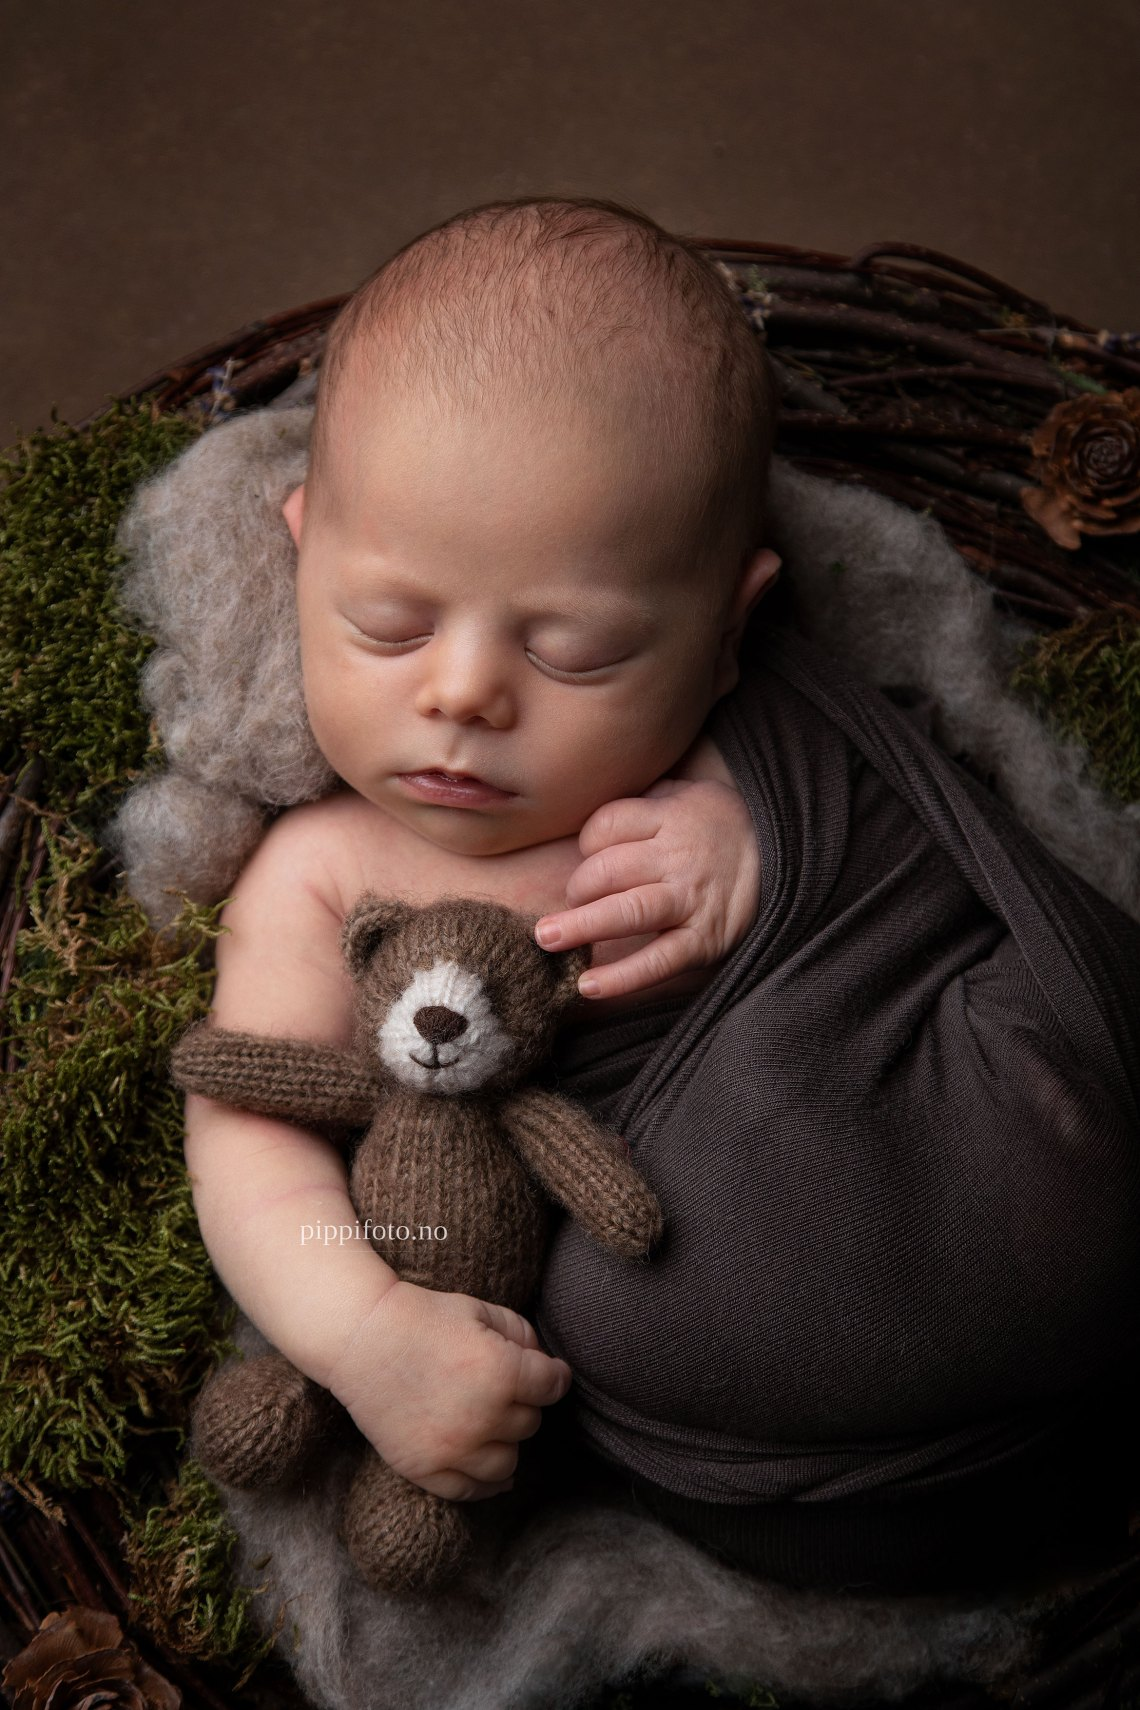 nyfødtbilder_nyfødtfotografering_babyfotograf_fotograf_Oslo_Kolbotn